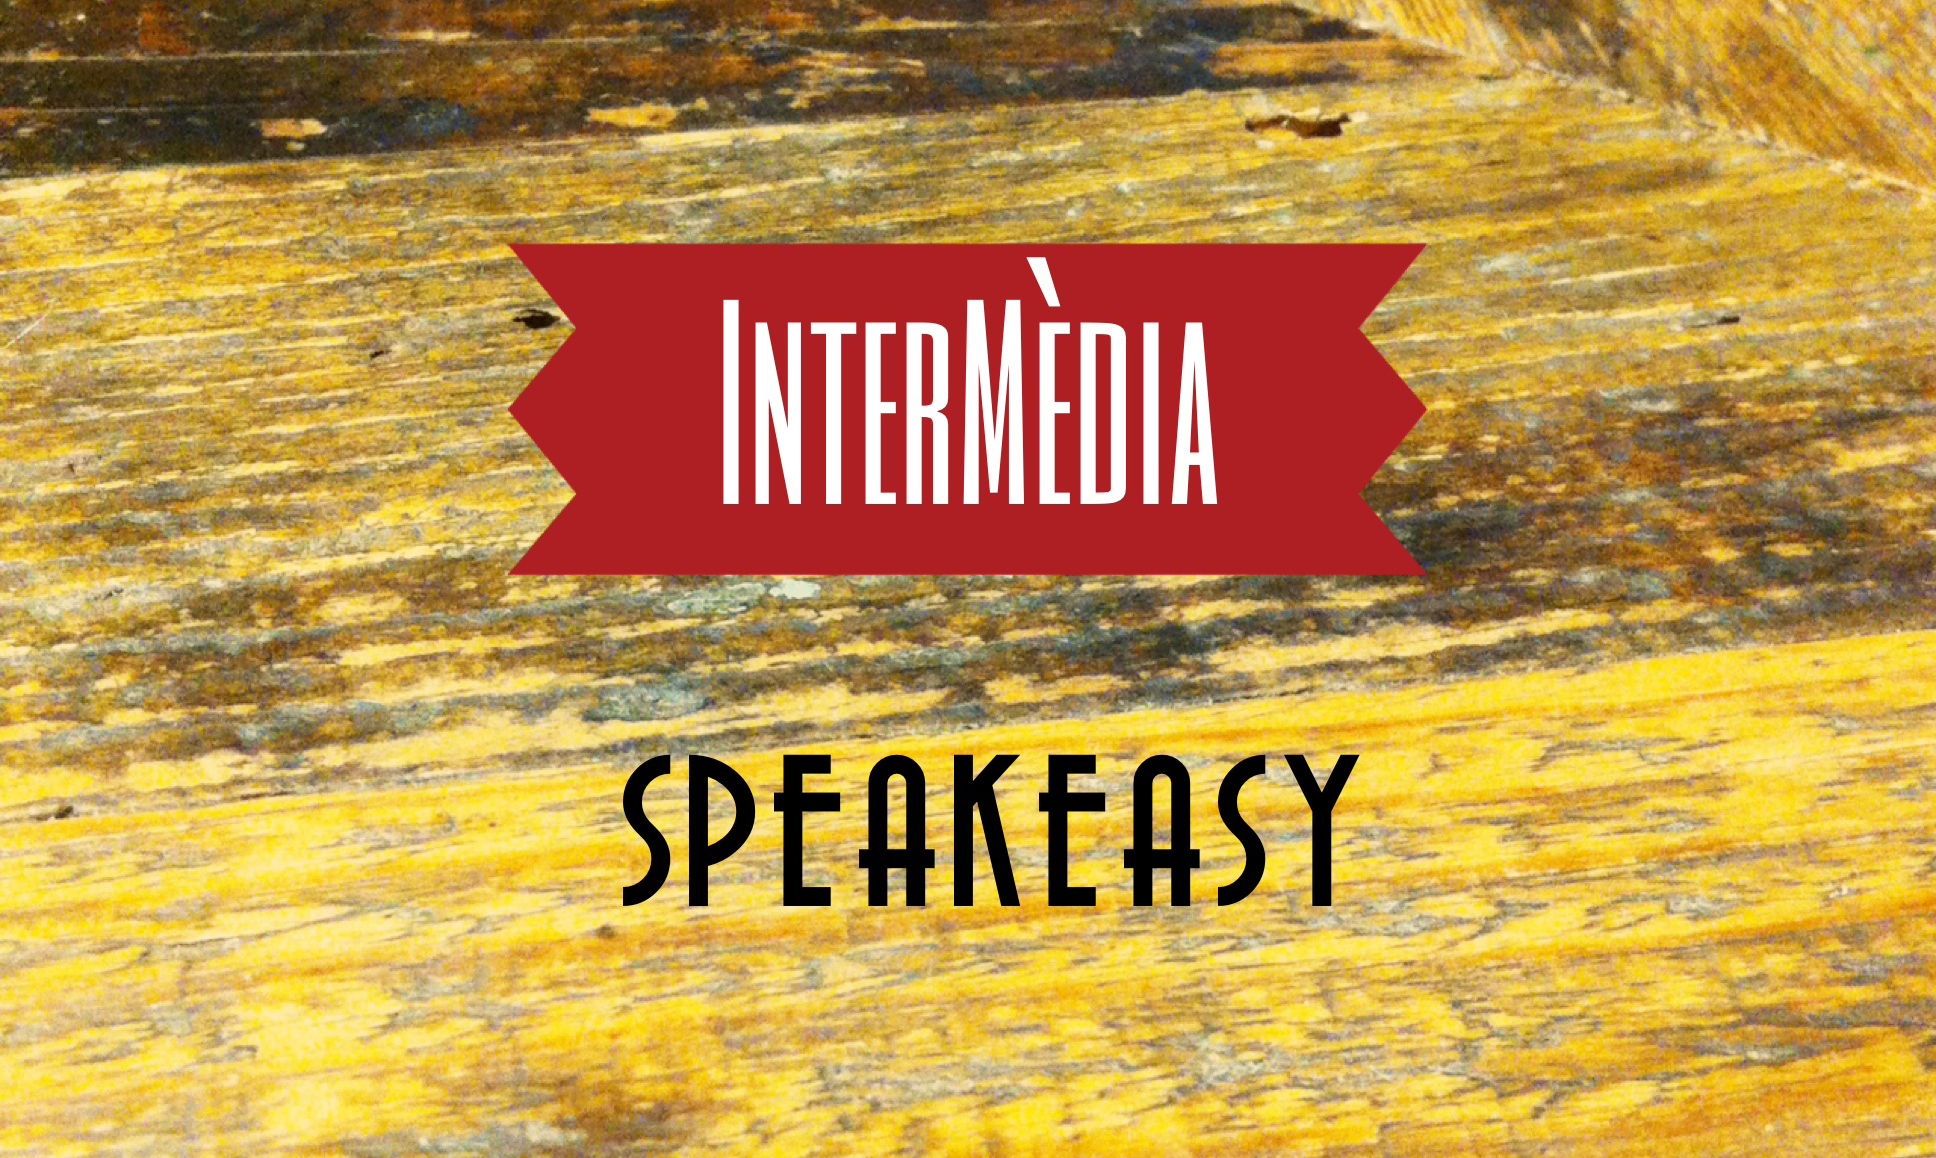 InterMèdia Speakeasy